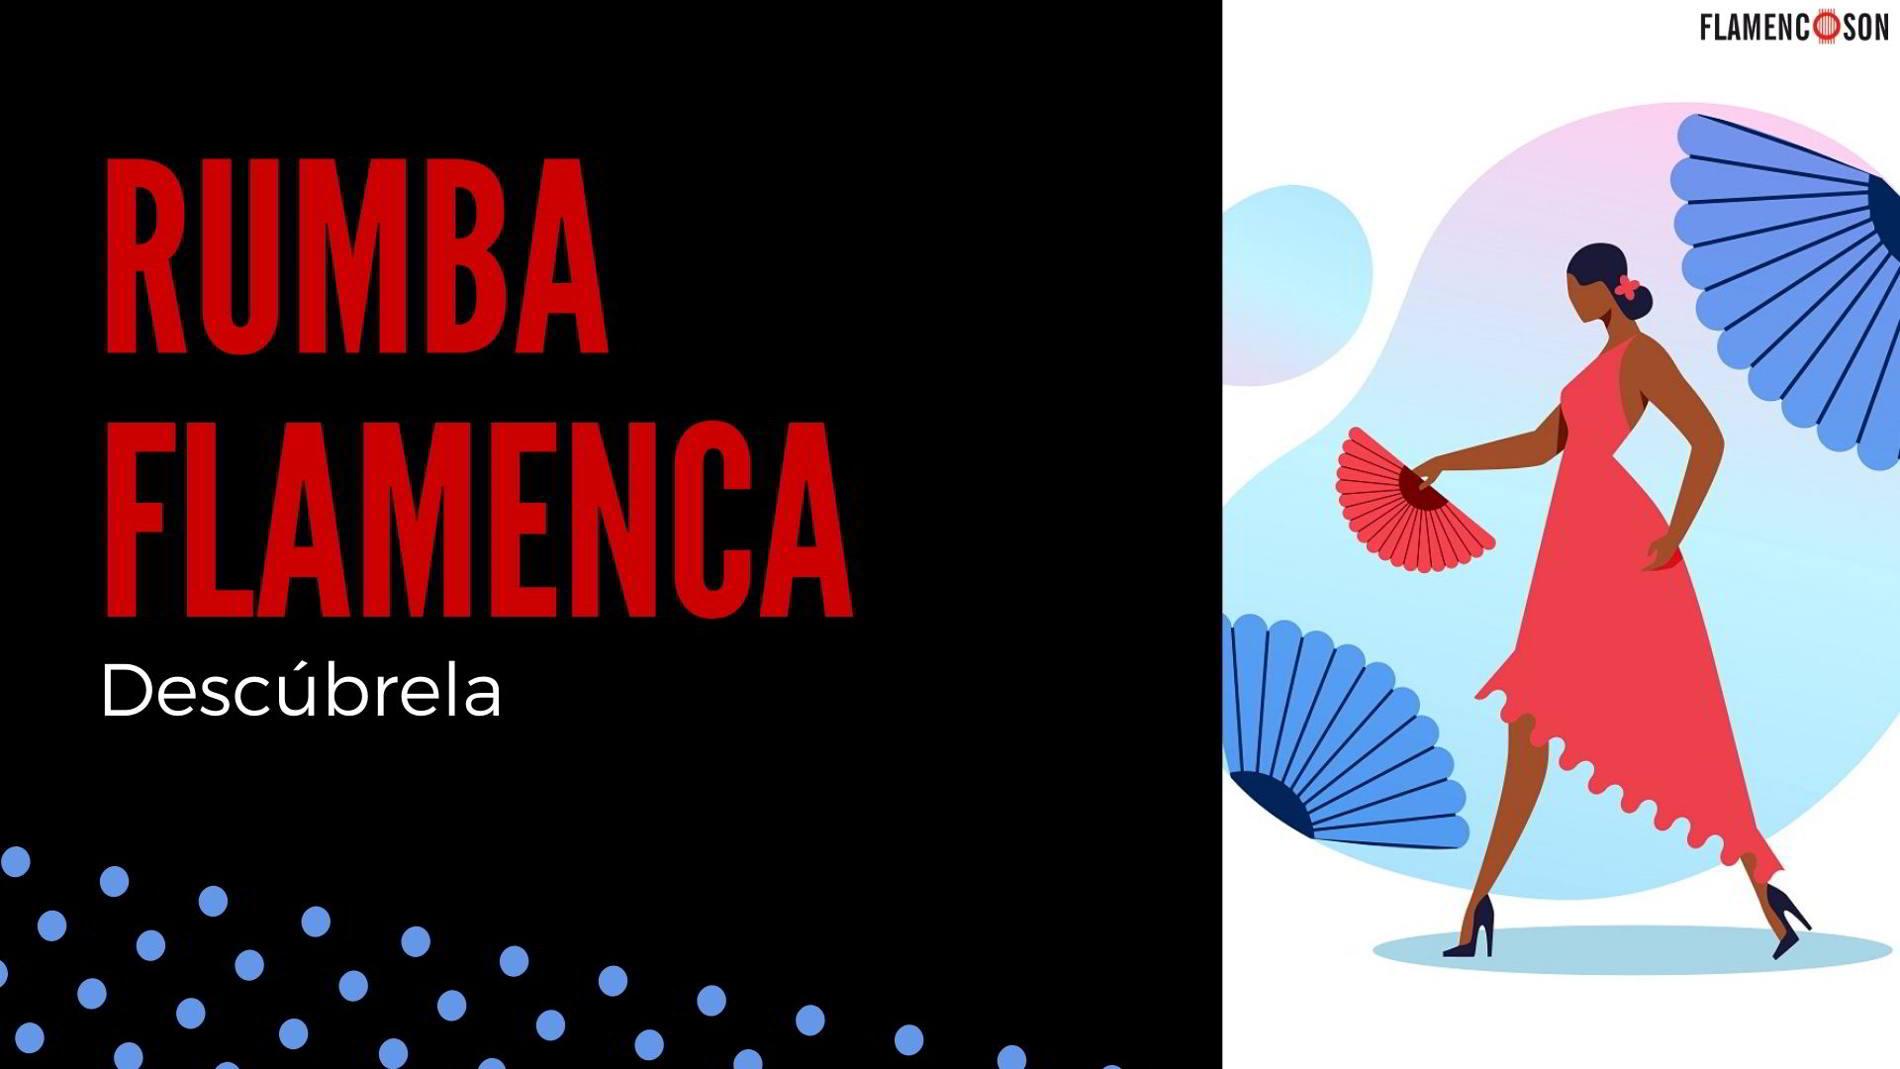 clases-de-flamenco-online-rumba-flamenca